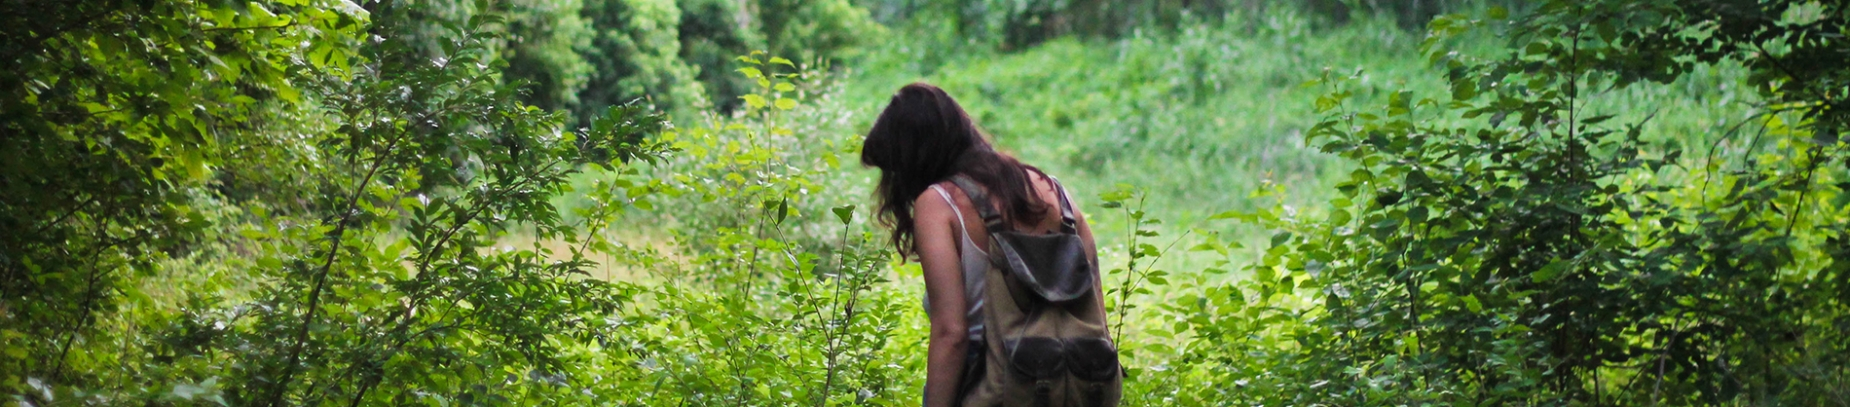 A women walking through a forest wearing a backpack